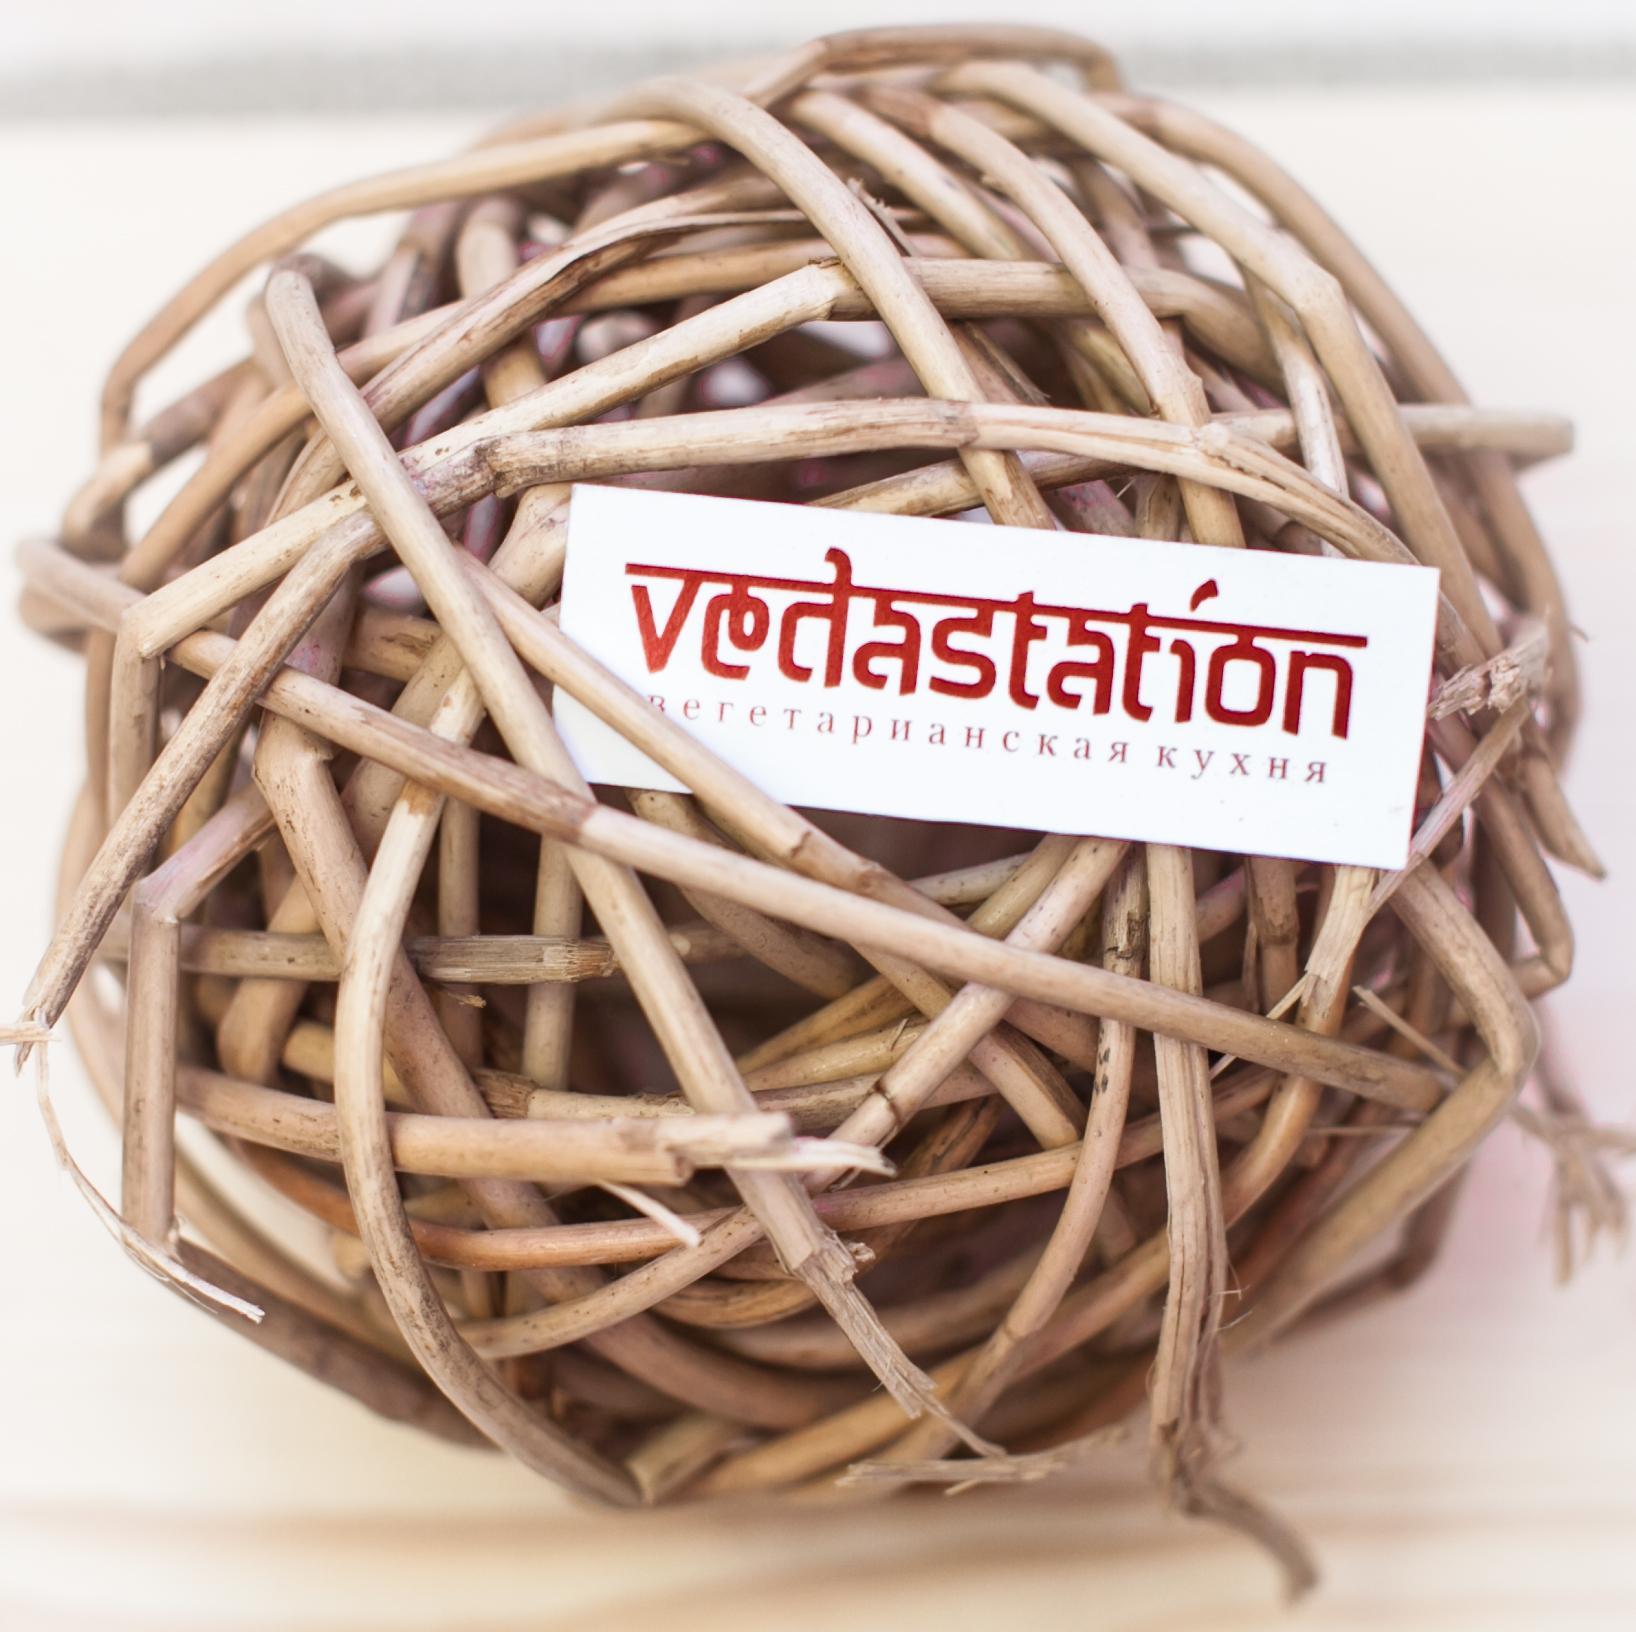 Vedastation вегетарианский кейтеринг